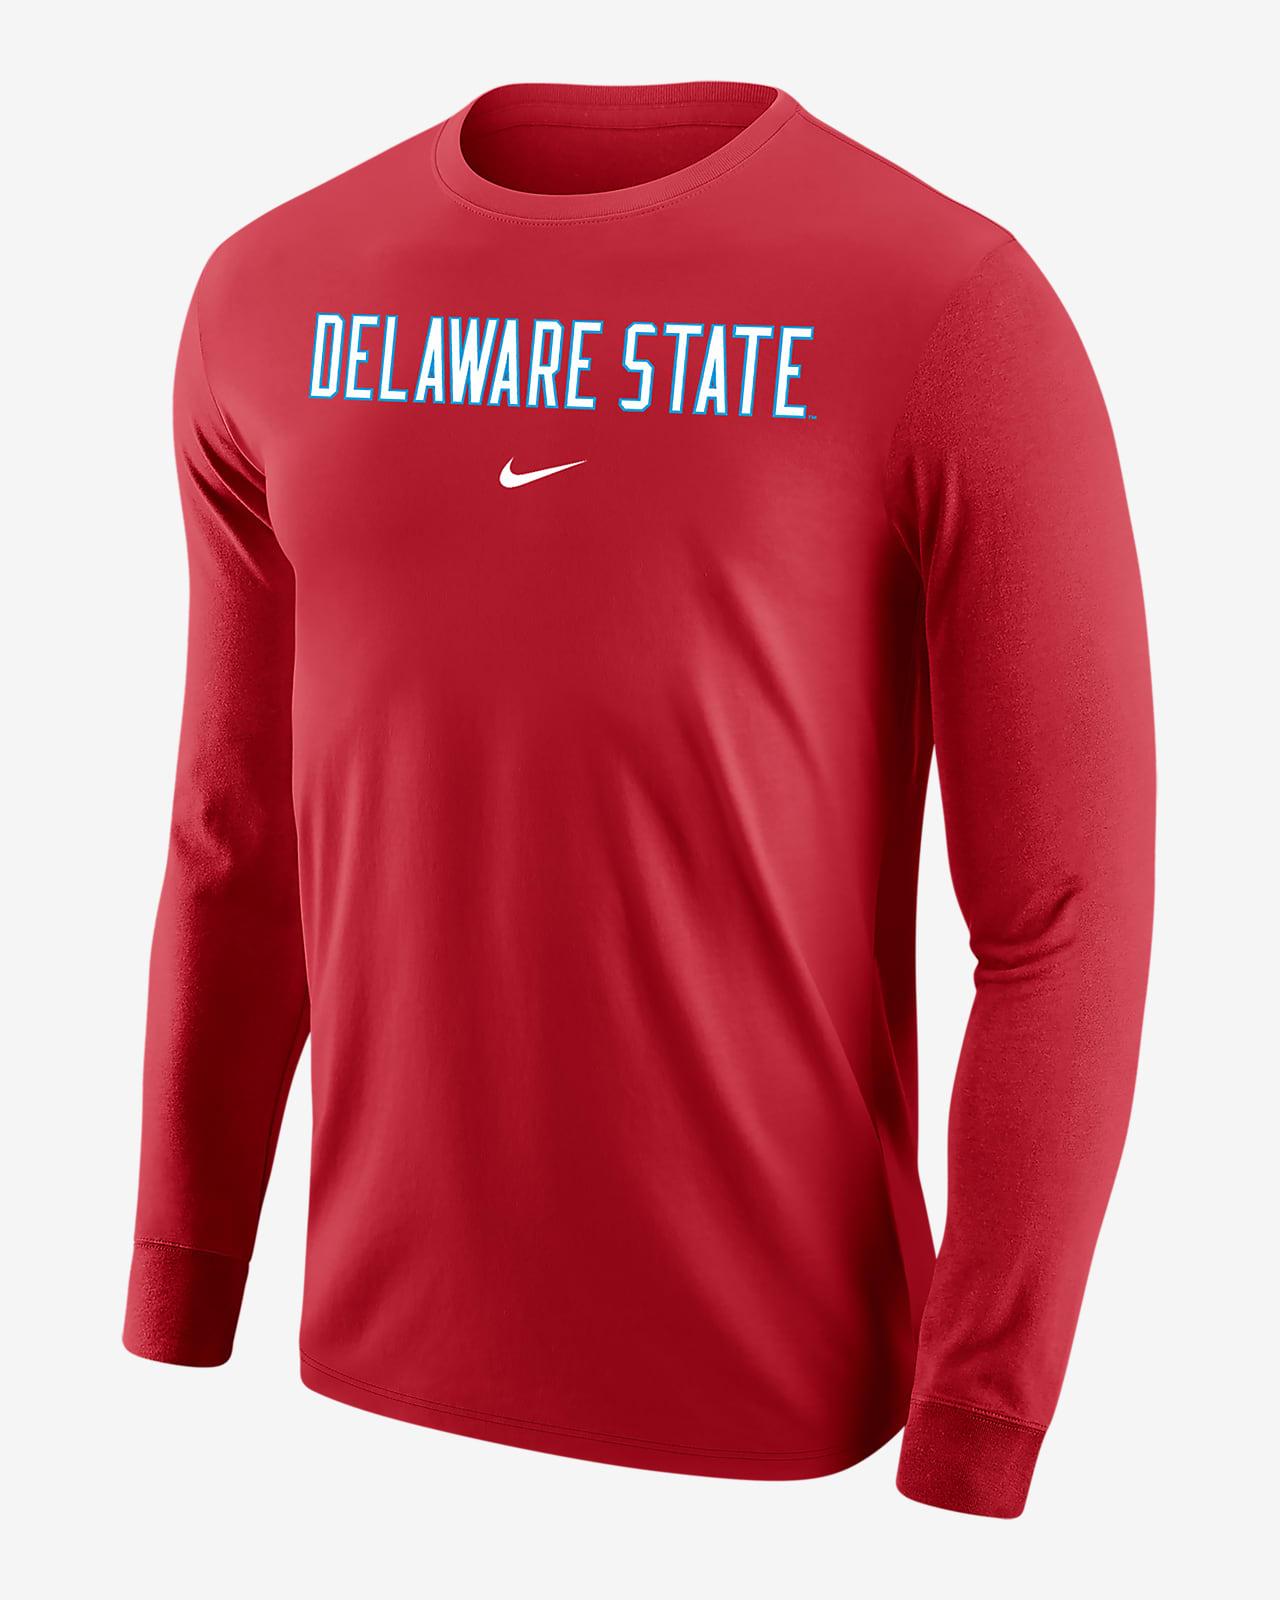 Nike College (Delaware State) Men's Long-Sleeve T-Shirt